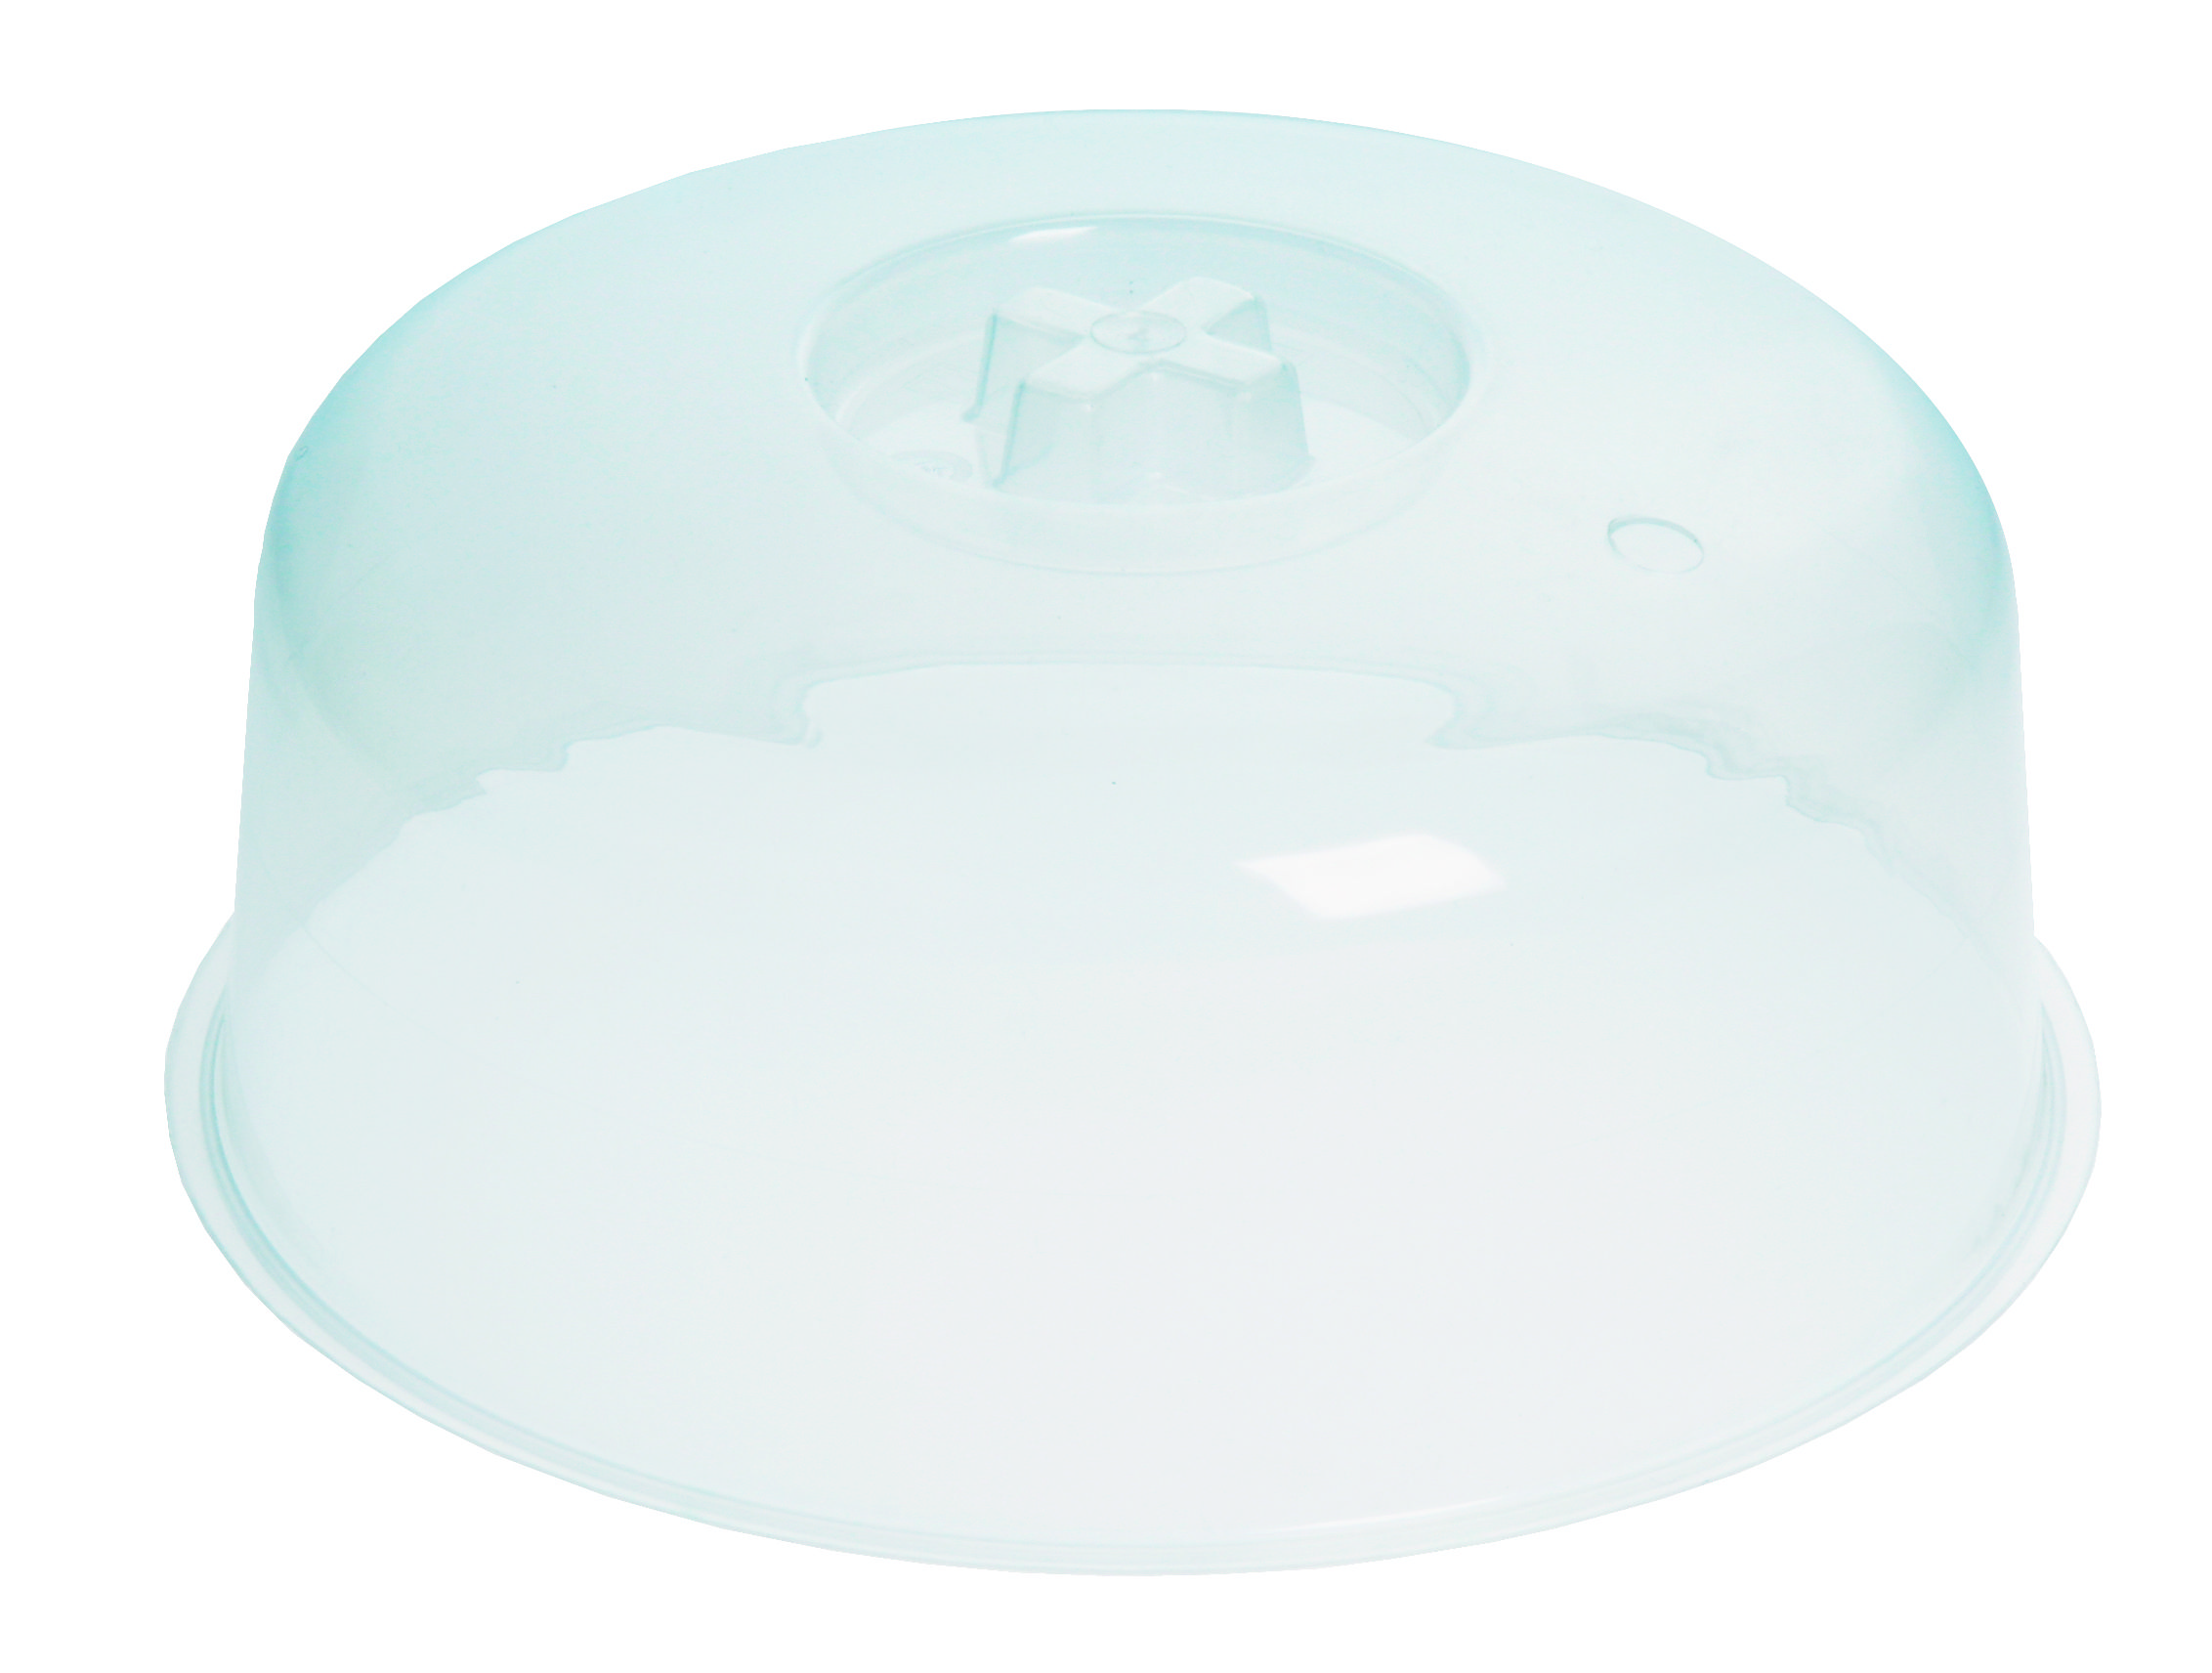 Image of Micro Cover fra Plast Team - Låg til mikroovn (3121)